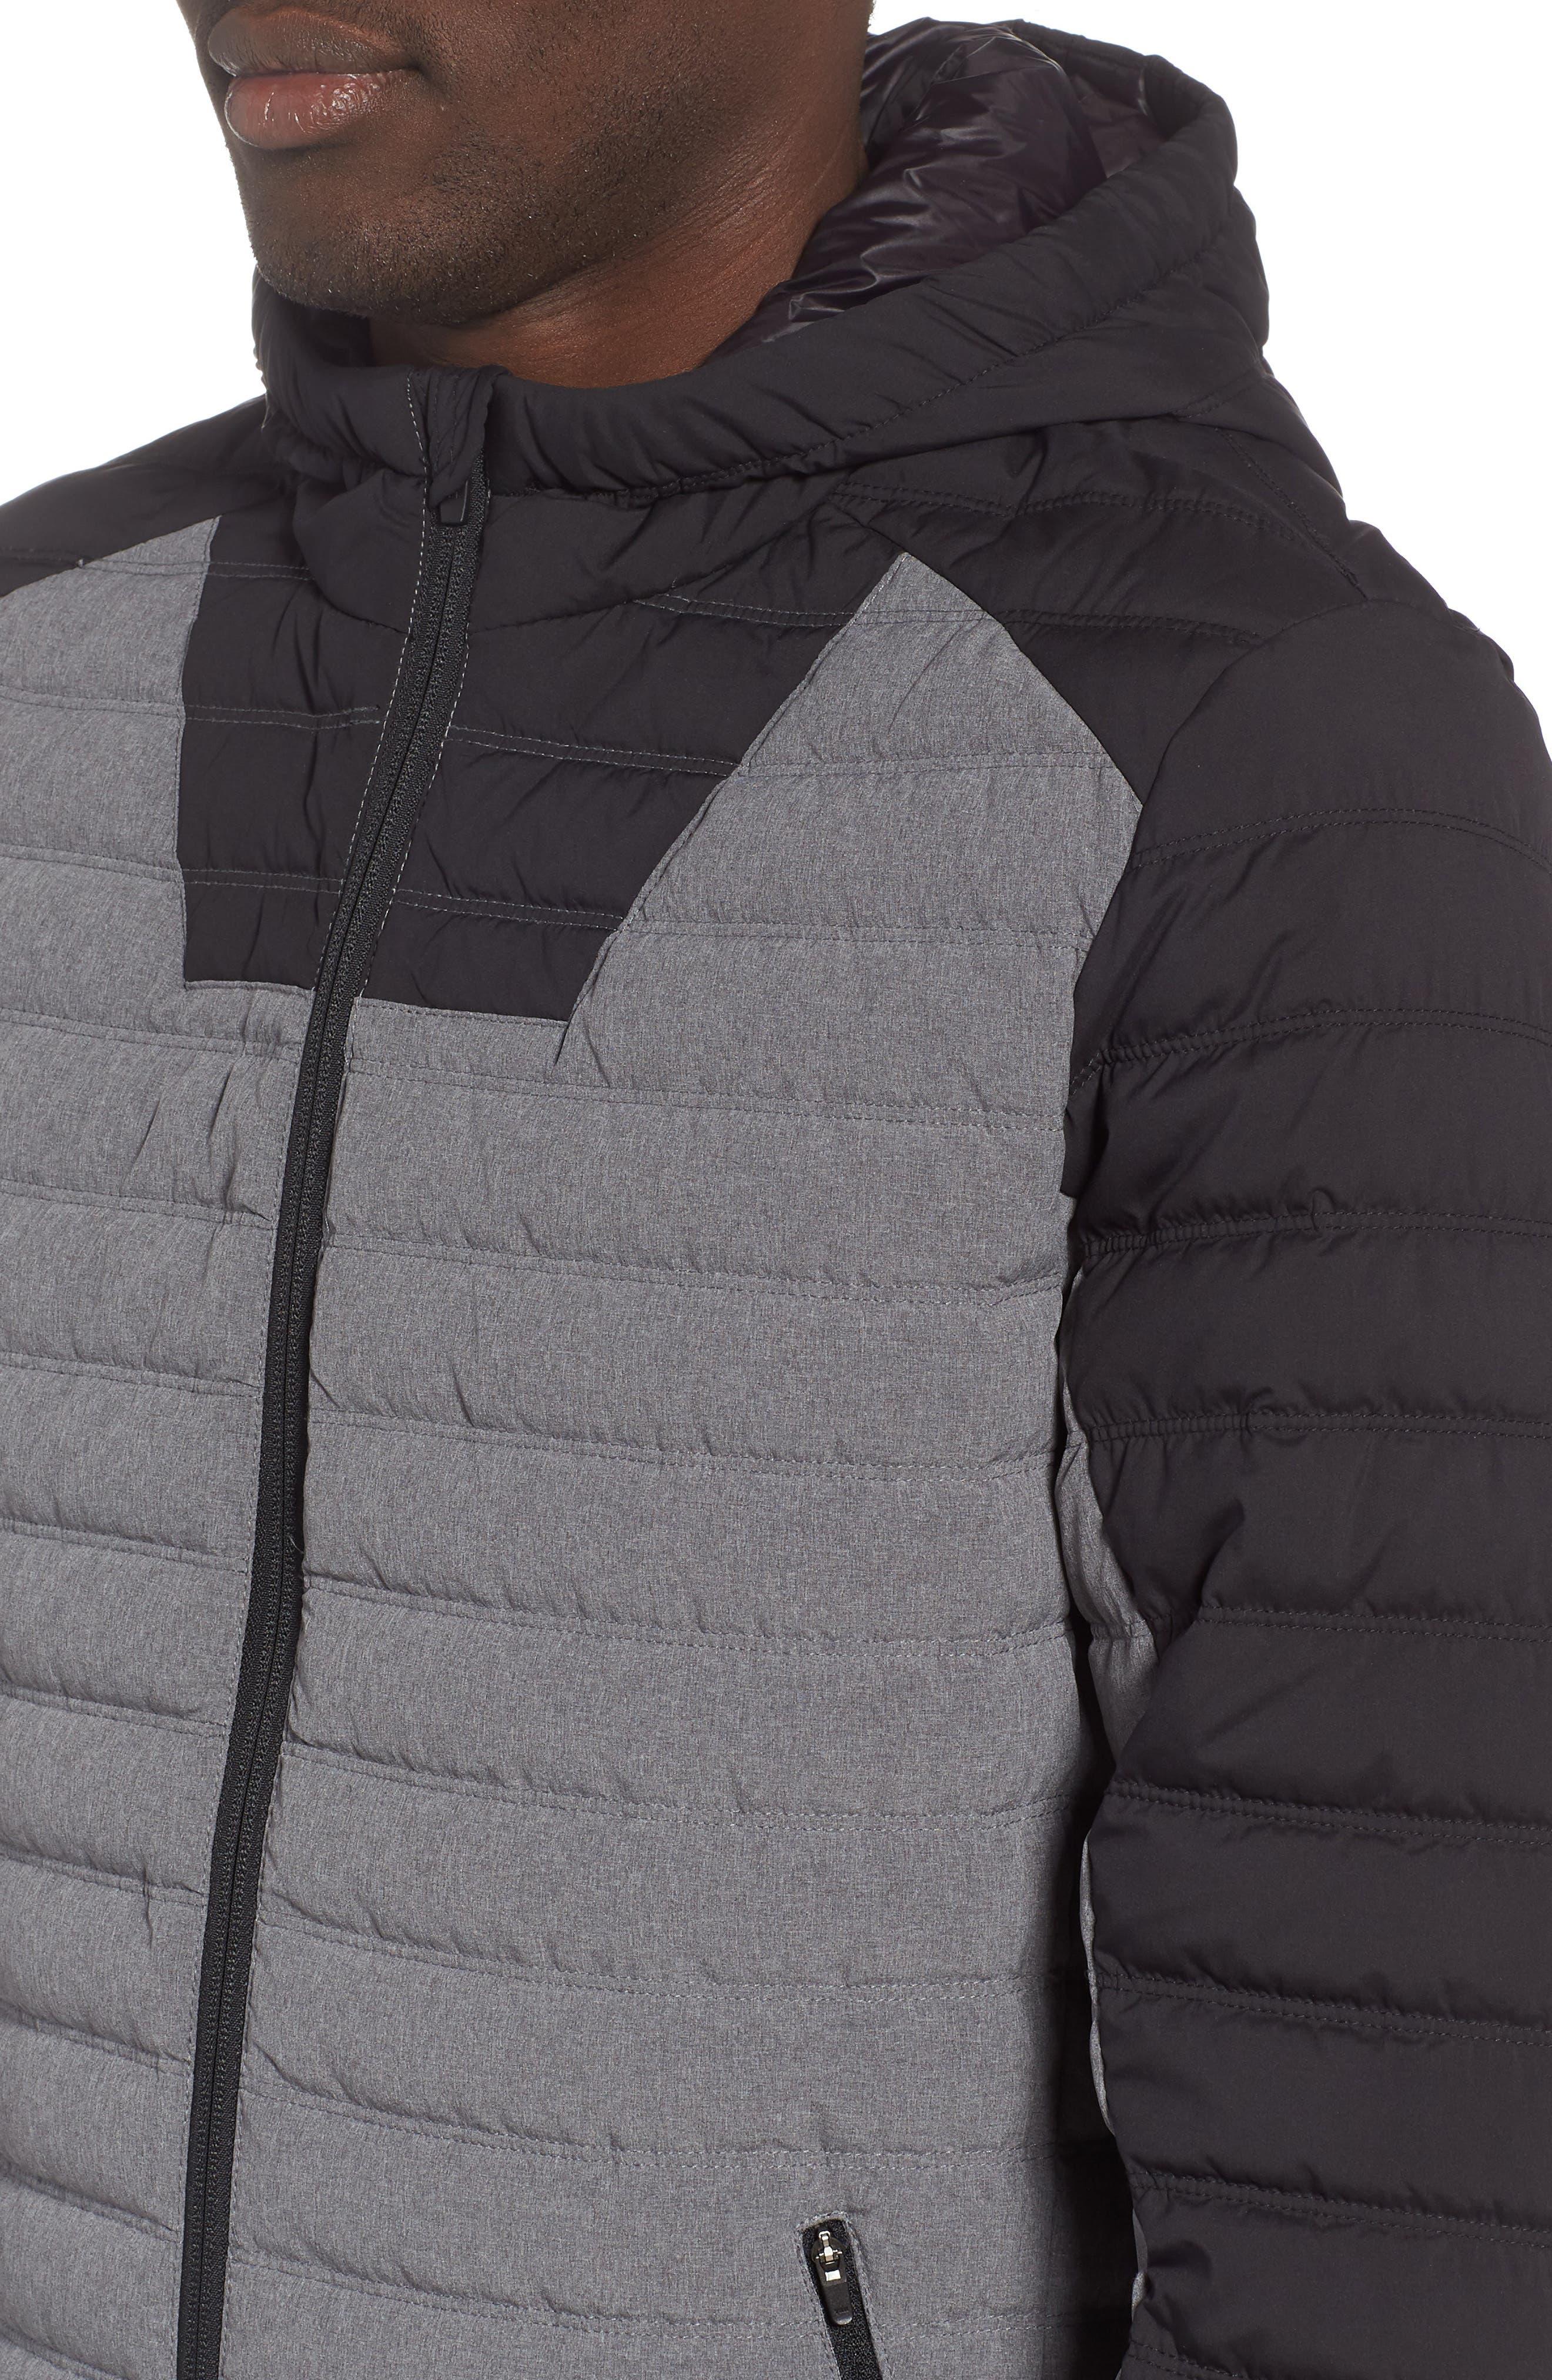 Hooded Water Resistant Down Jacket,                             Alternate thumbnail 4, color,                             BLACK GREY OBSIDIAN